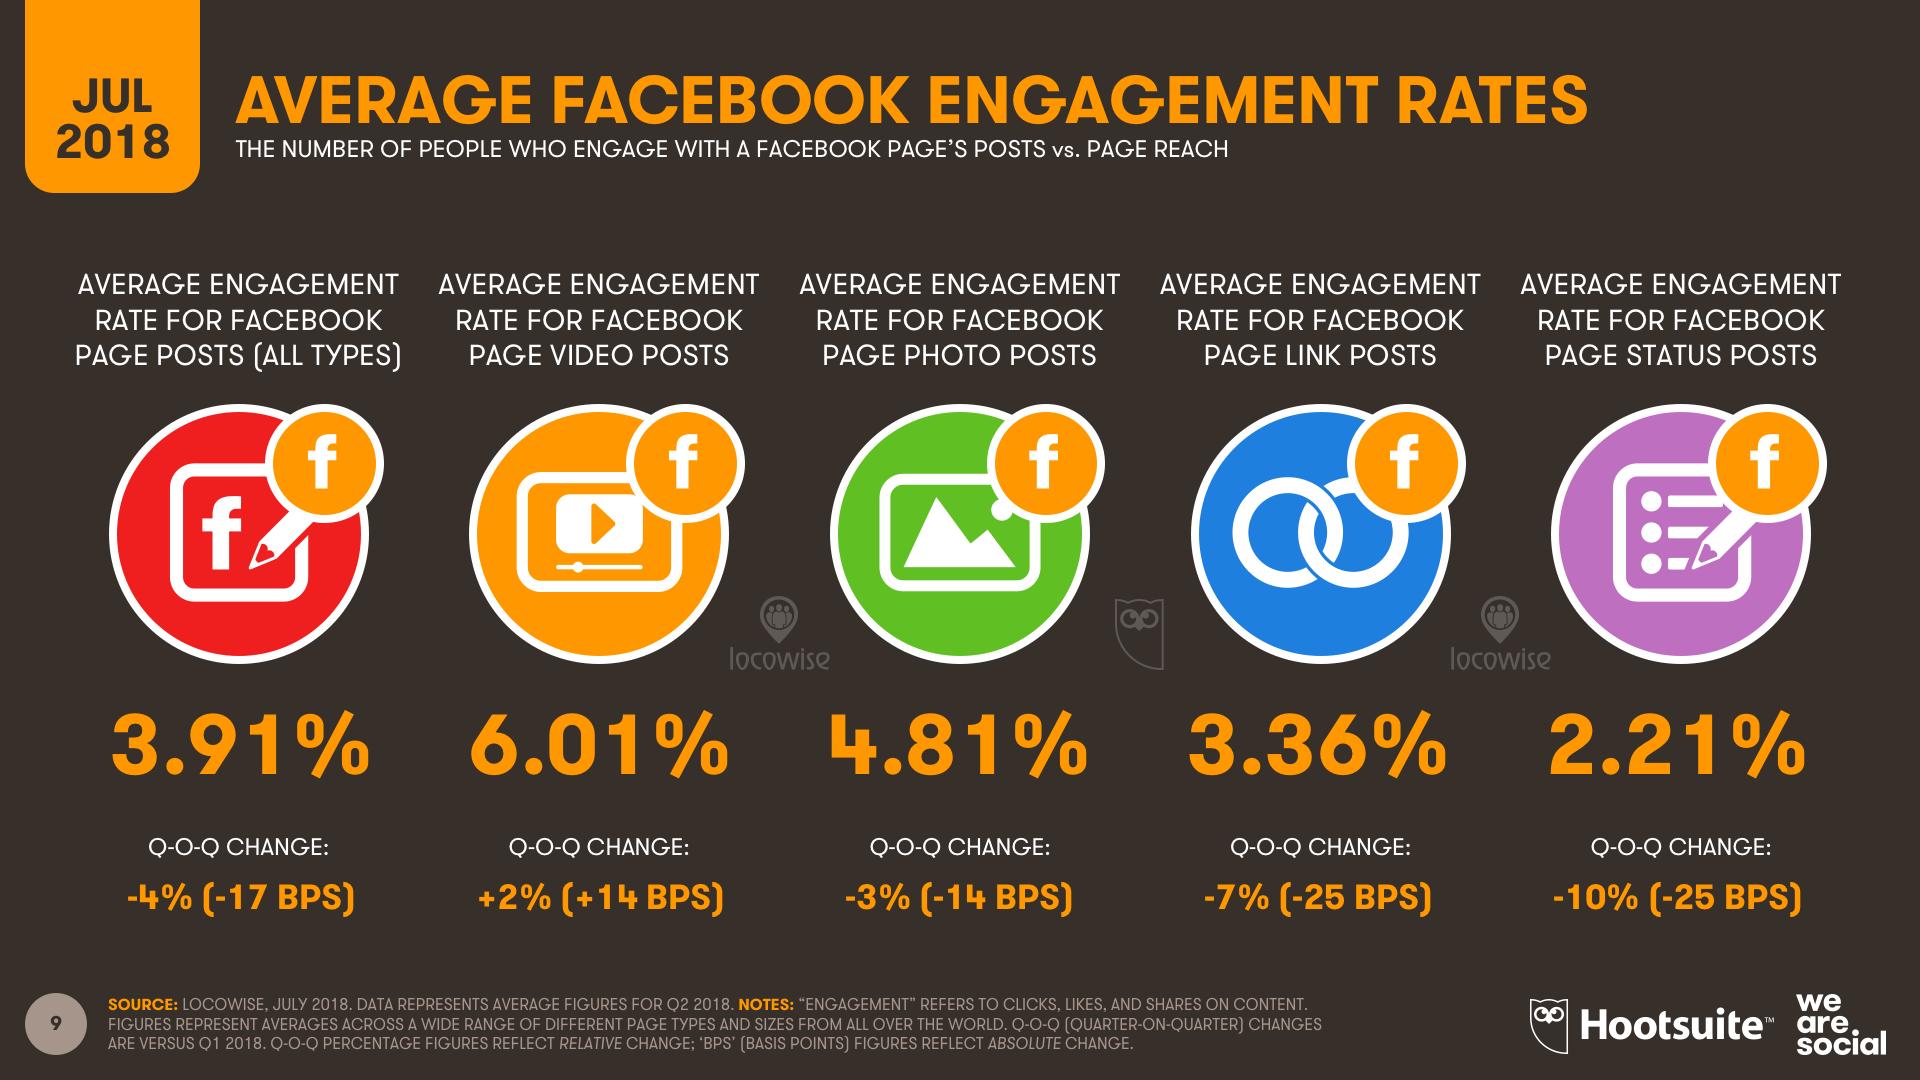 Facebook Average Engagement Rates July 2018 DataReportal